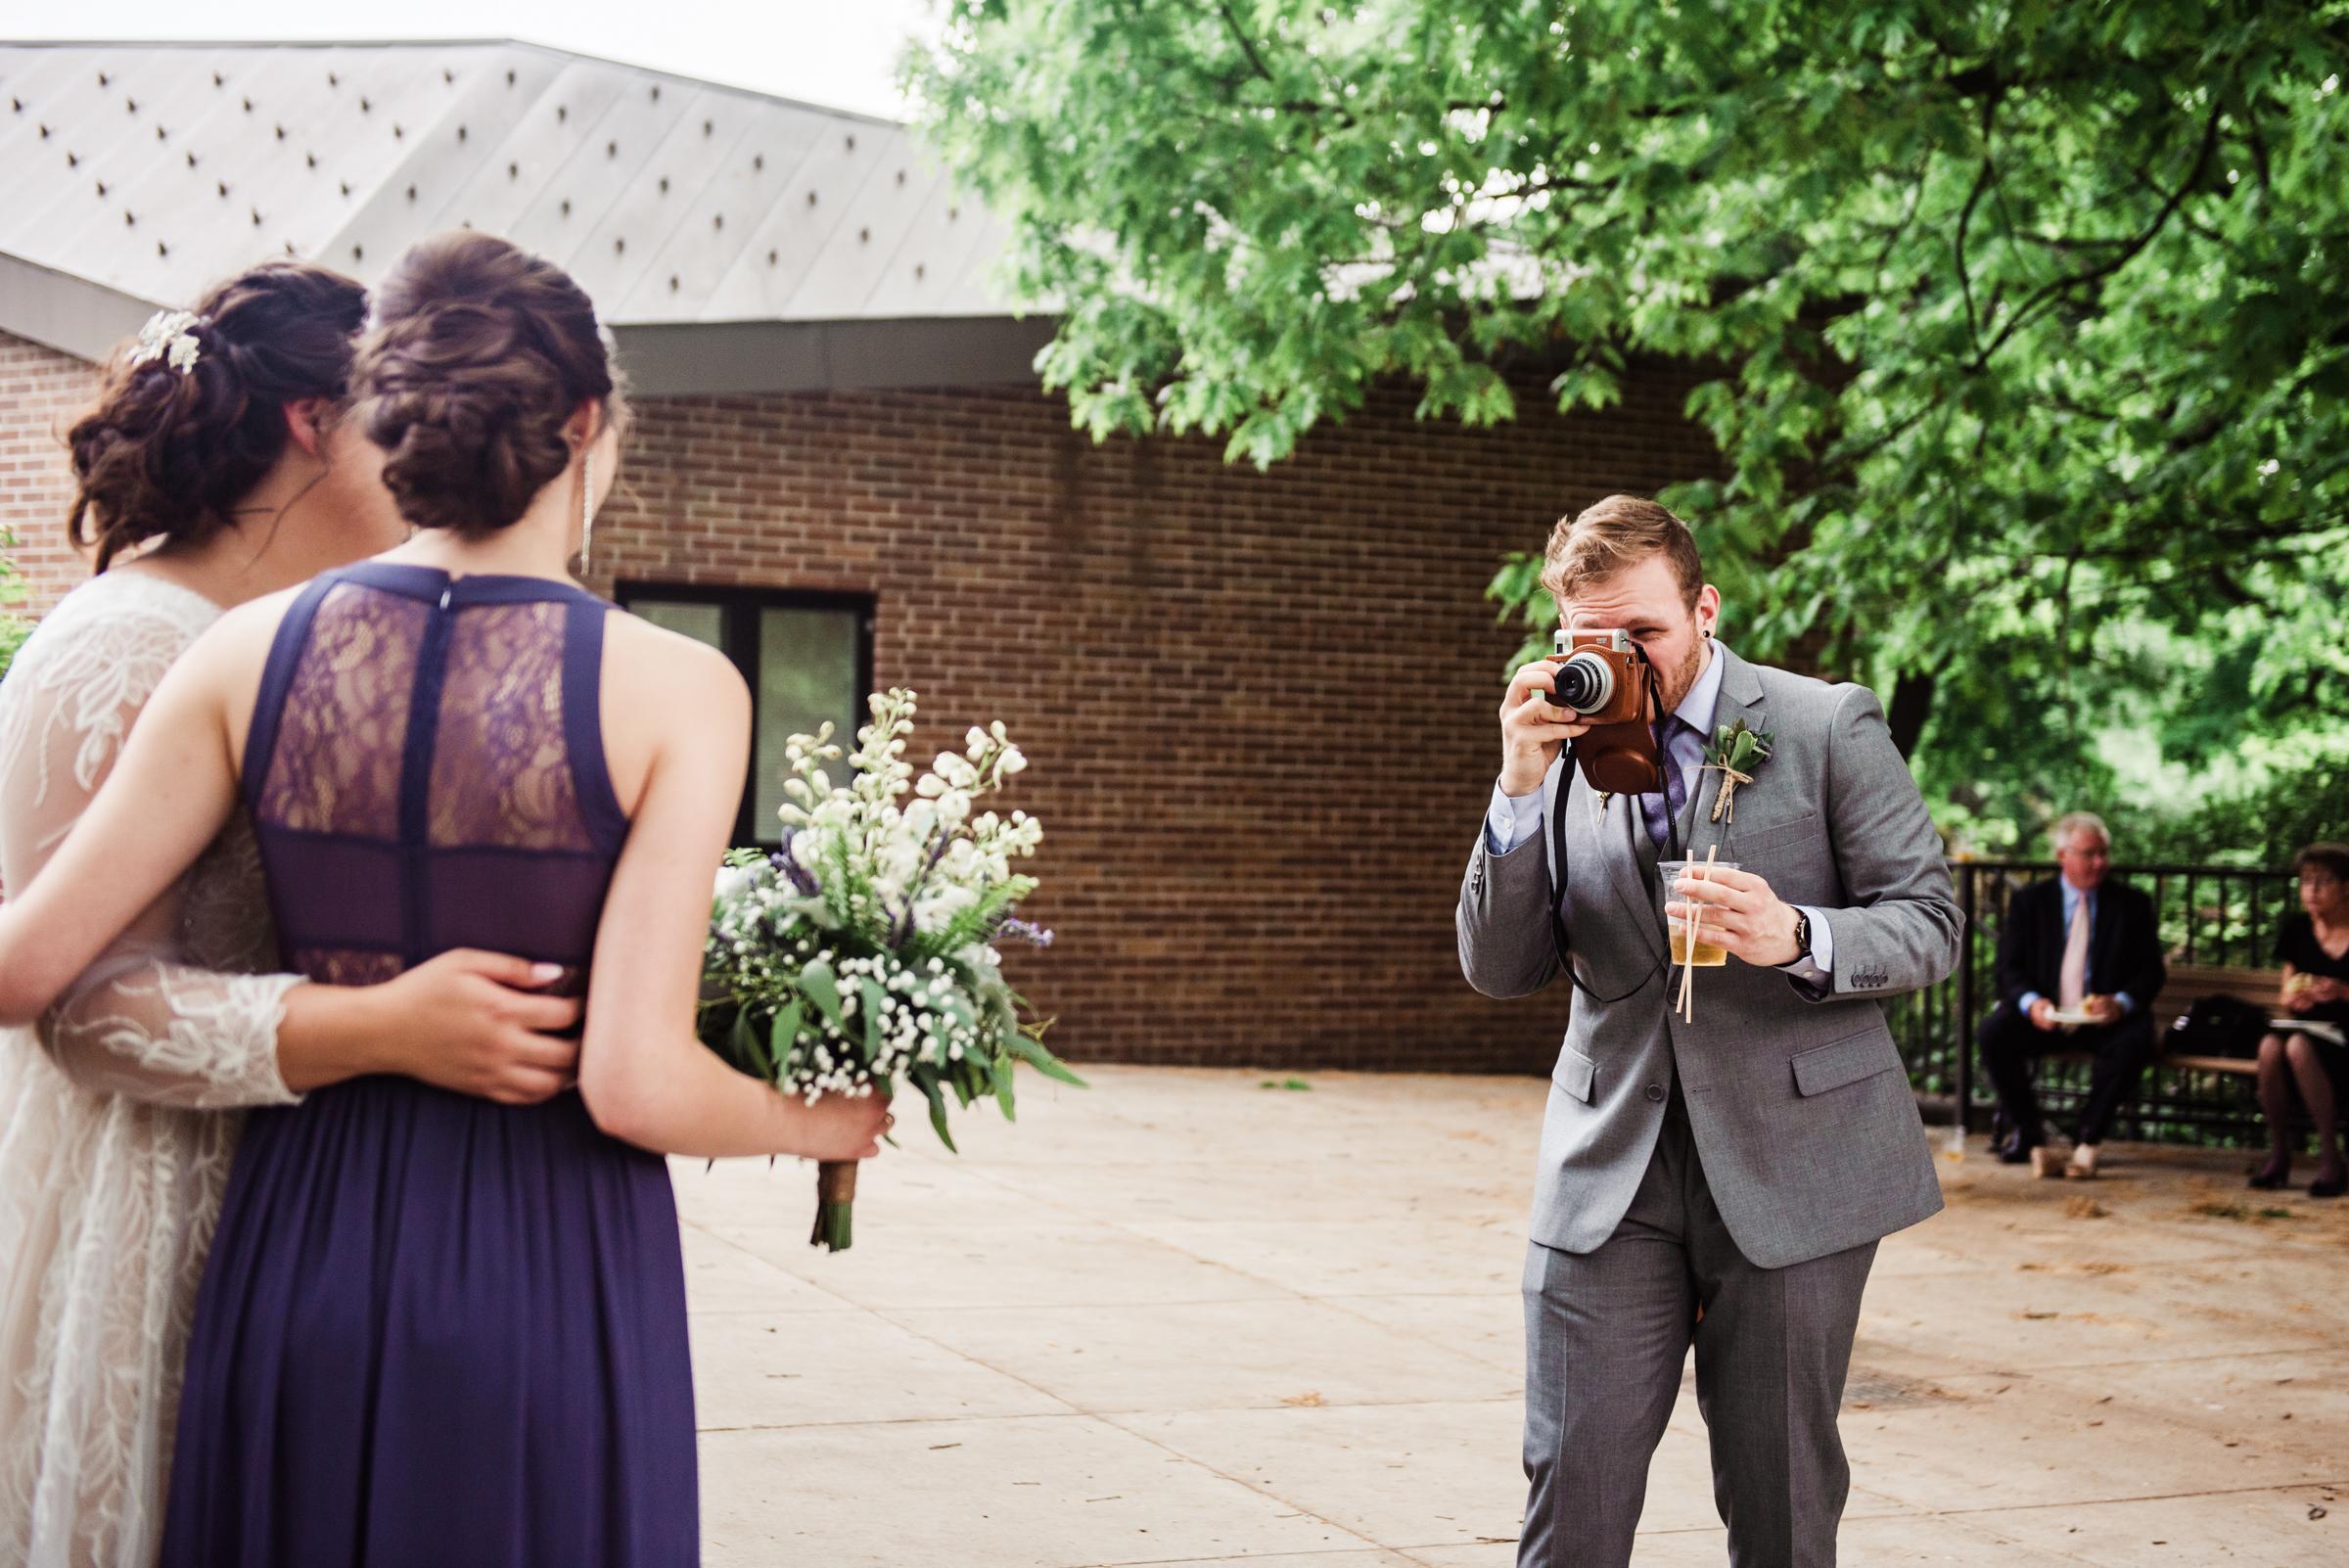 Studio_180_Lamberton_Conservatory_Rochester_Wedding_JILL_STUDIO_Rochester_NY_Photographer_DSC_8707.jpg